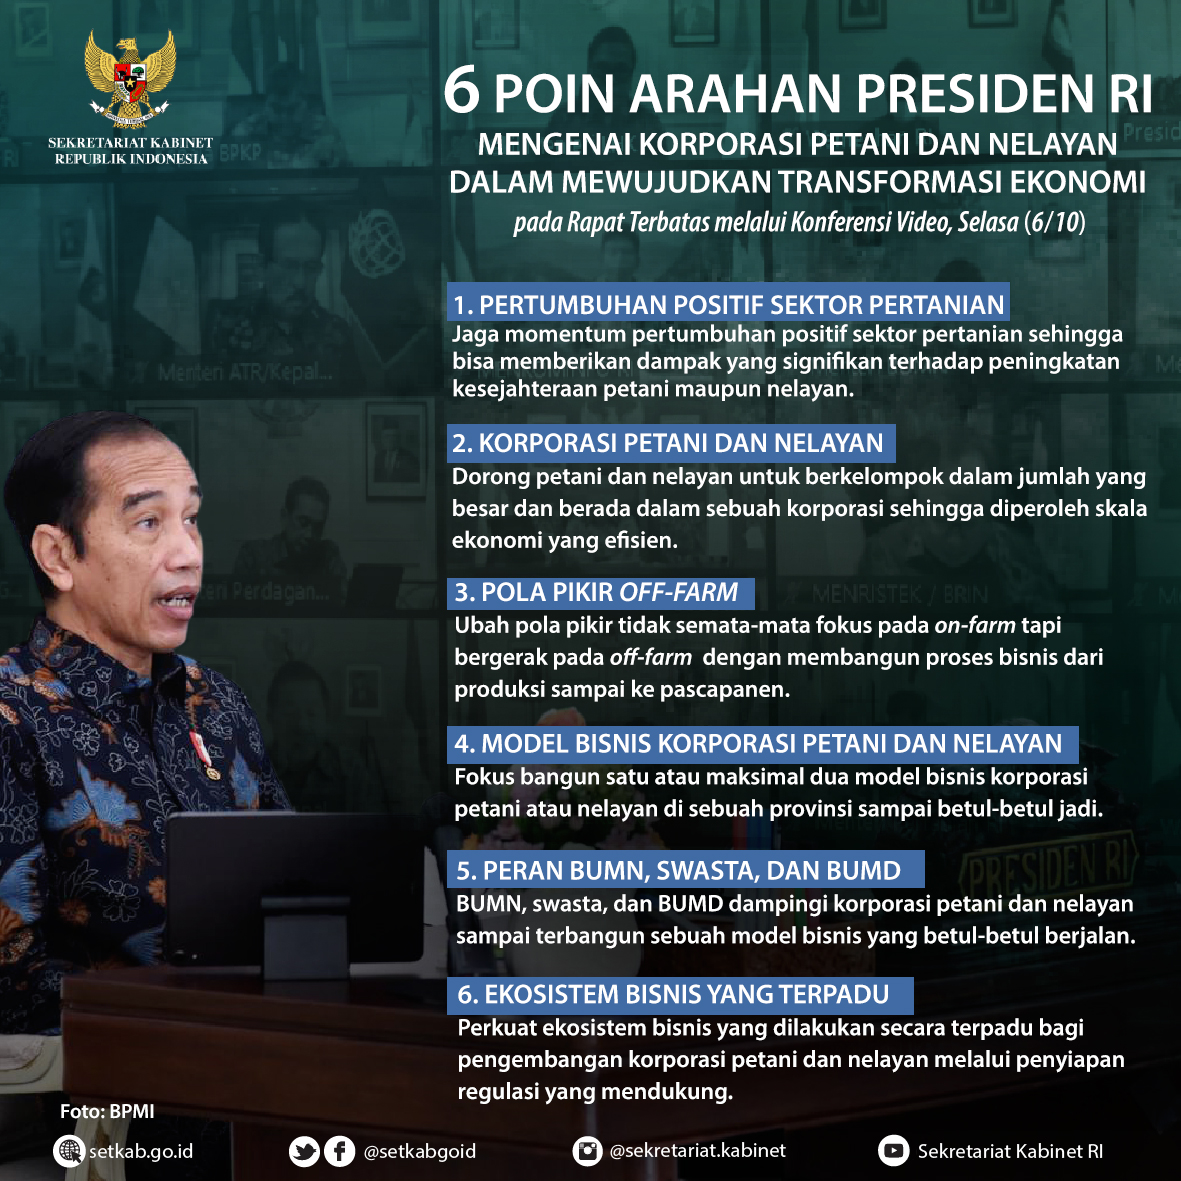 "Arahan Presiden Joko Widodo pada Rapat Terbatas mengenai ""Korporasi Petani dan Nelayan dalam Mewujudkan Transformasi Ekonomi"", Selasa (6/10)"